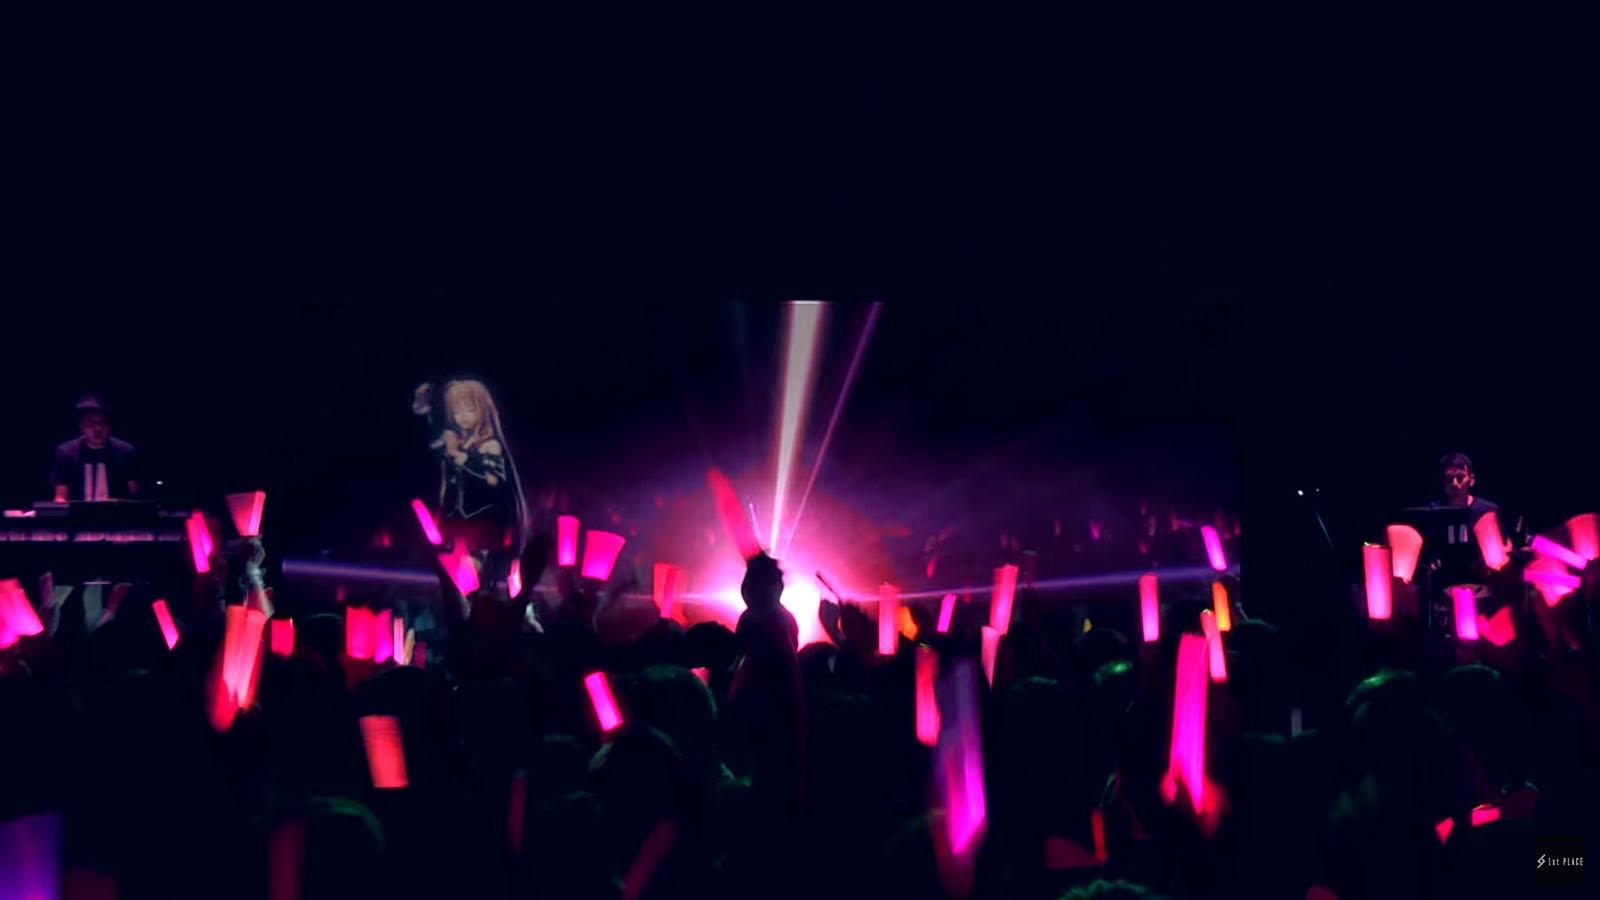 Diamond Days 【 LIVE MUSIC VIDEO 】